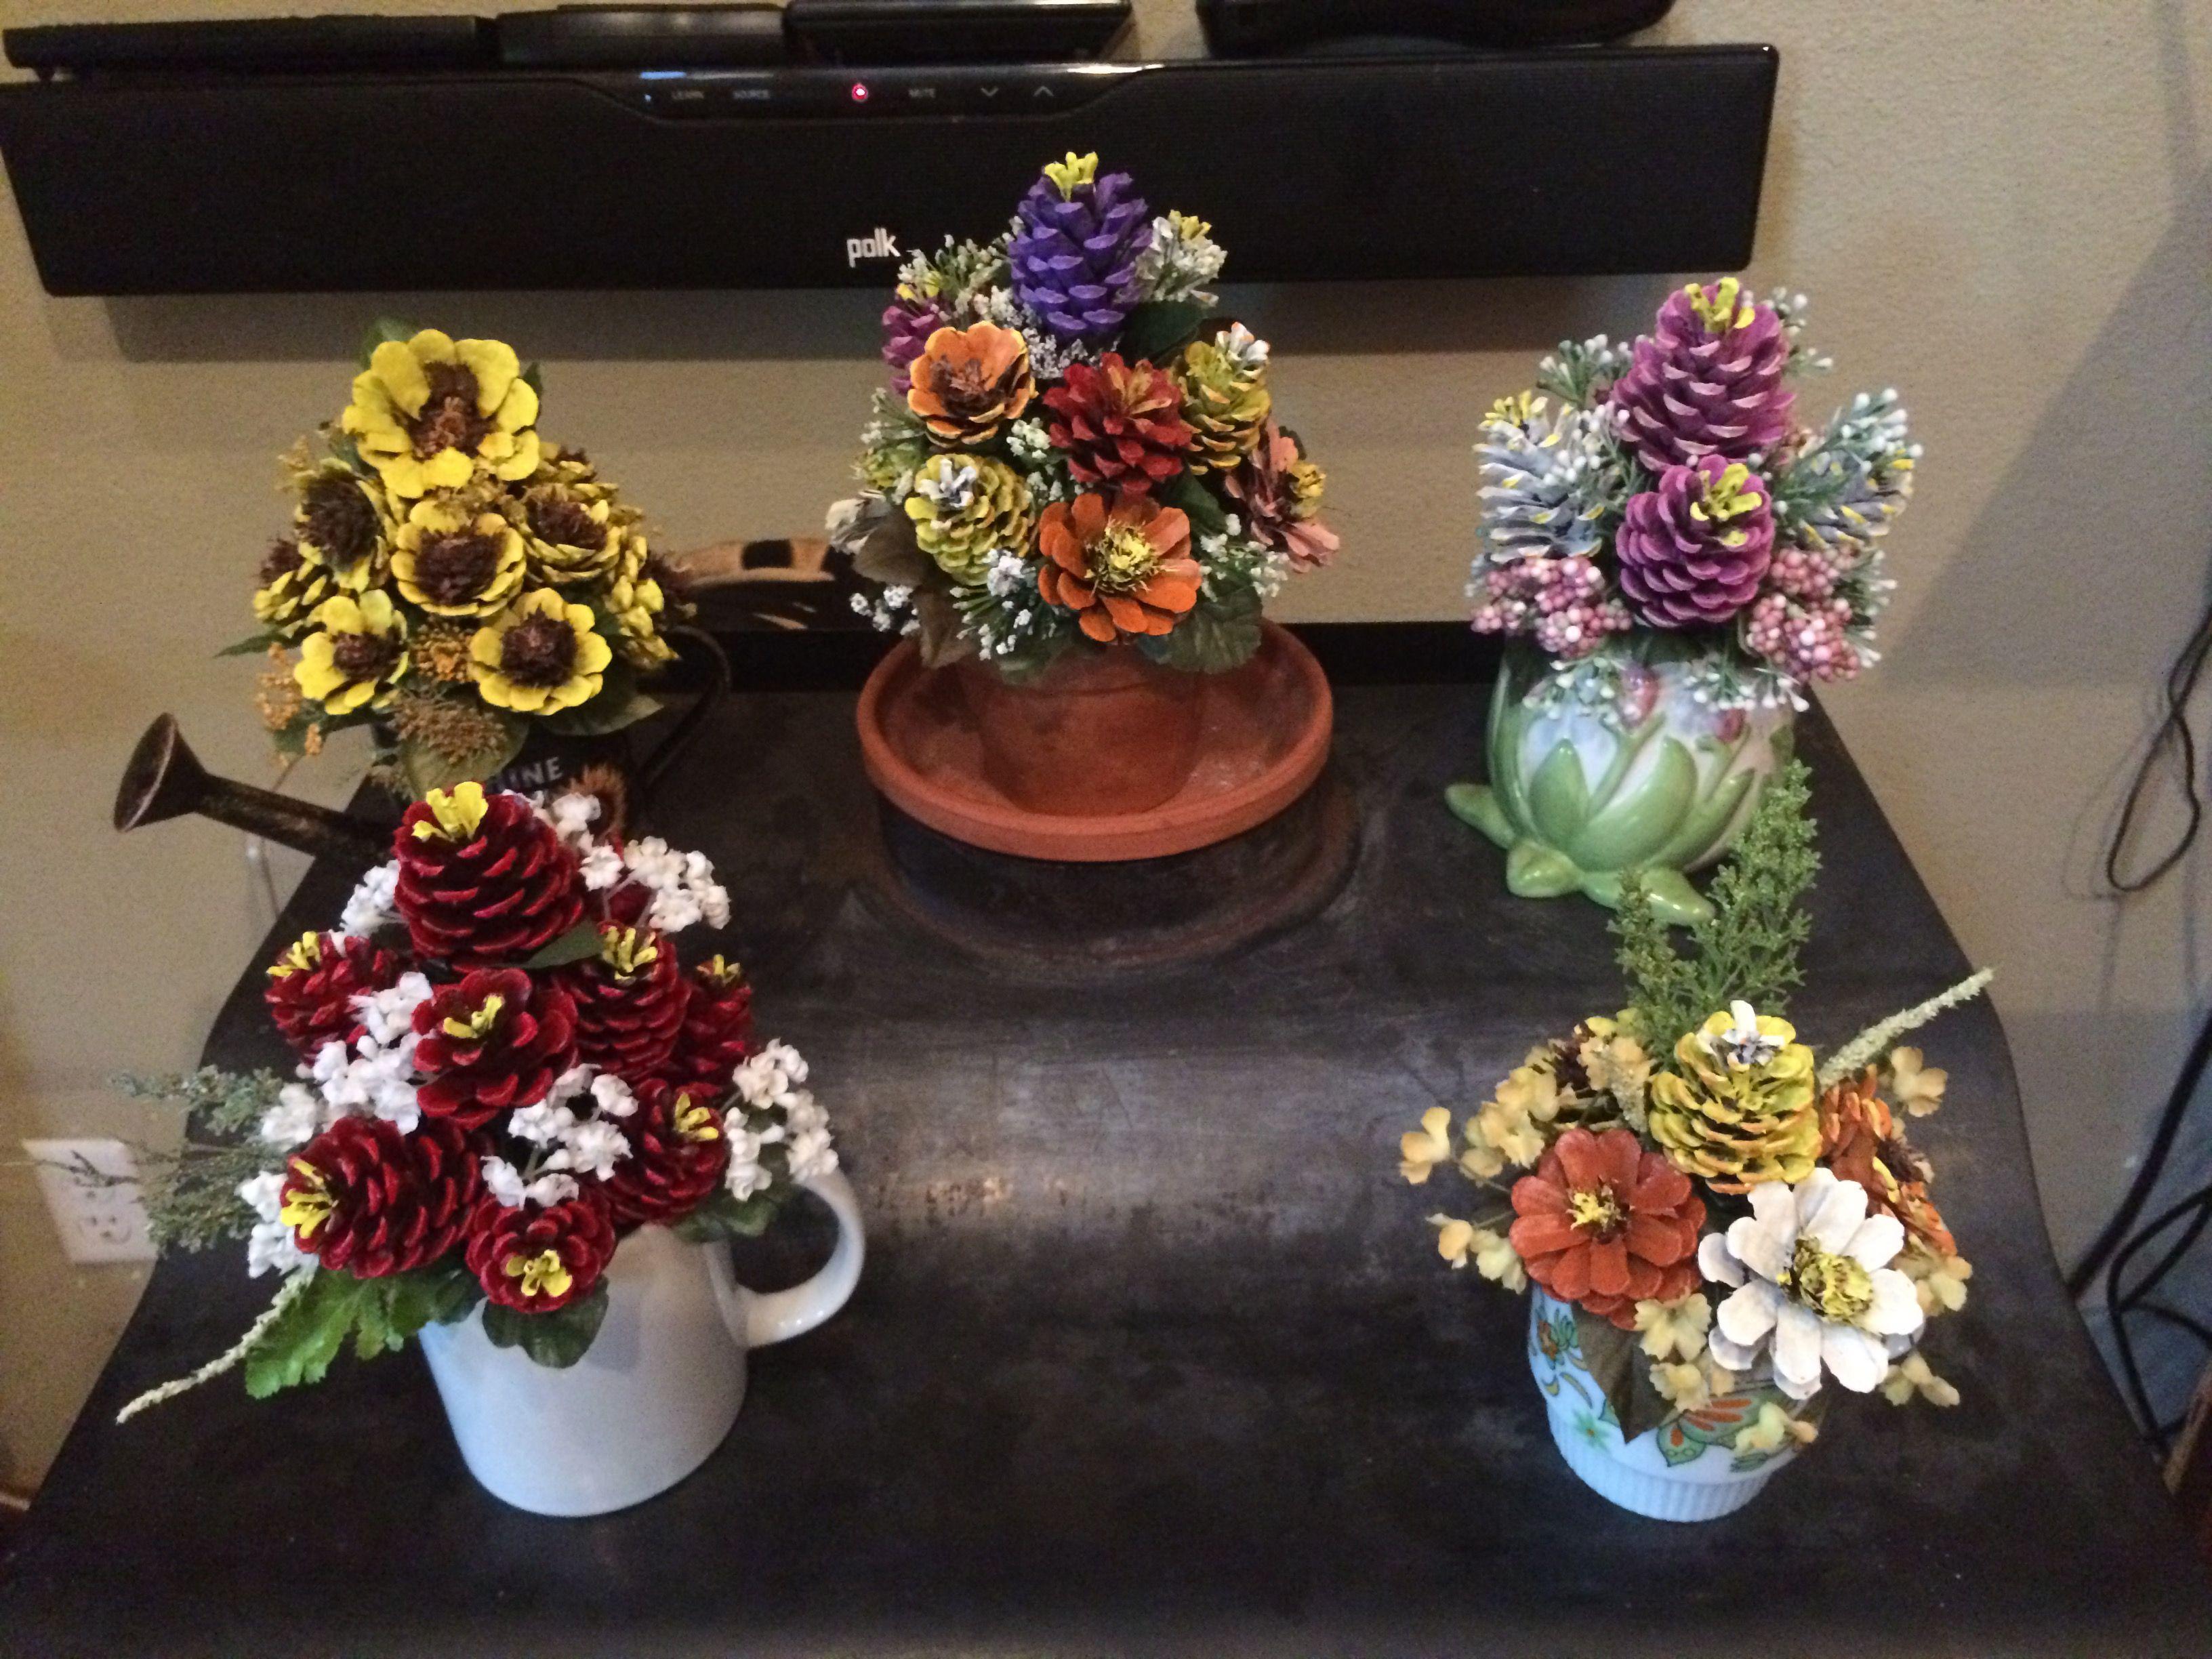 Pinecone Flower Arrangements By Cat Pine Cone Art Pine Cone Crafts Cones Crafts